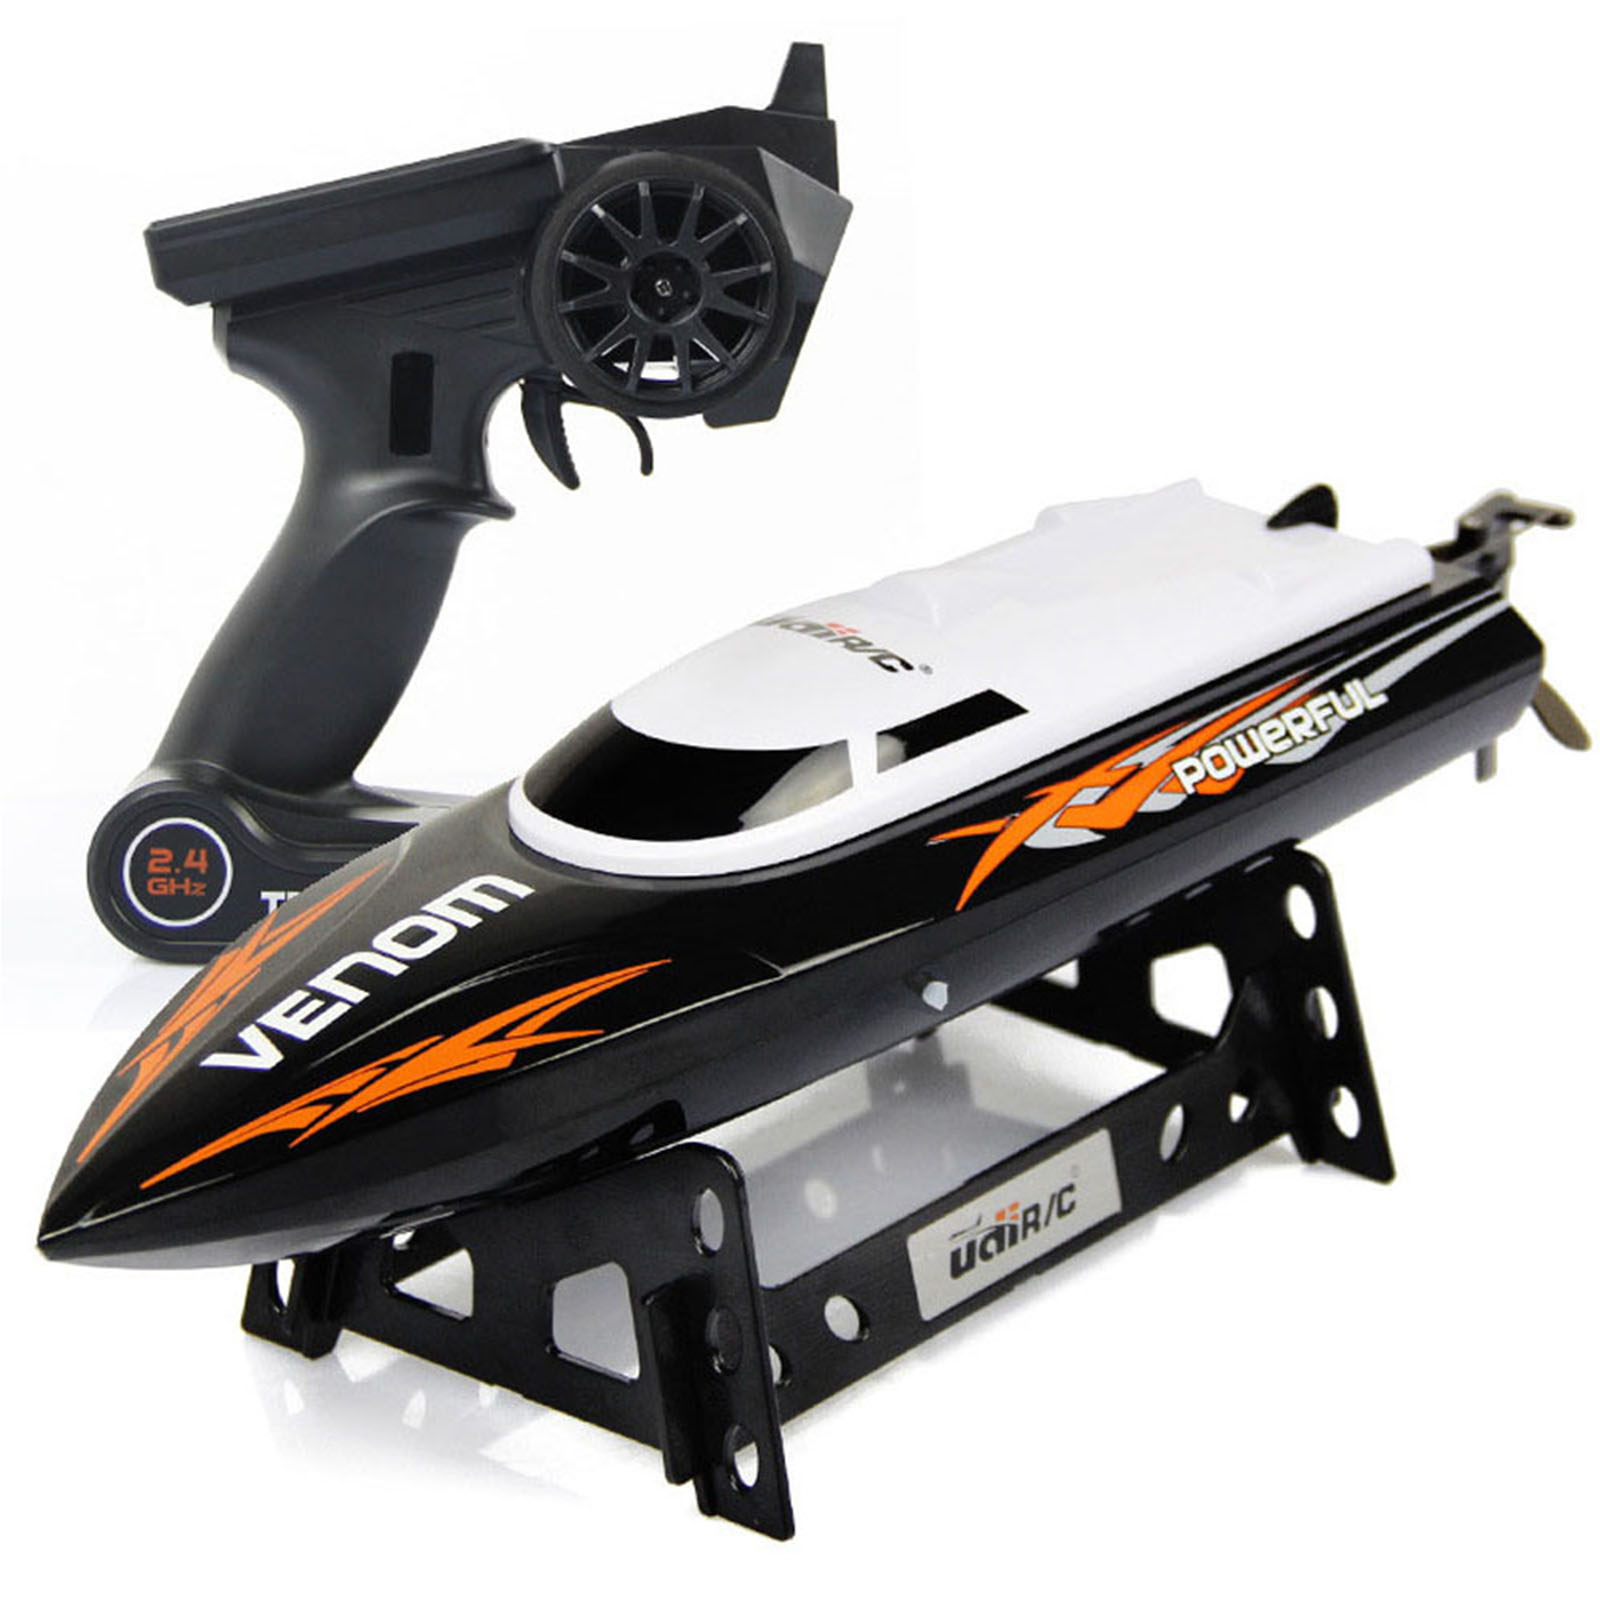 Udirc 2.4GHz High Speed Remote Control Electric Boat (Black)